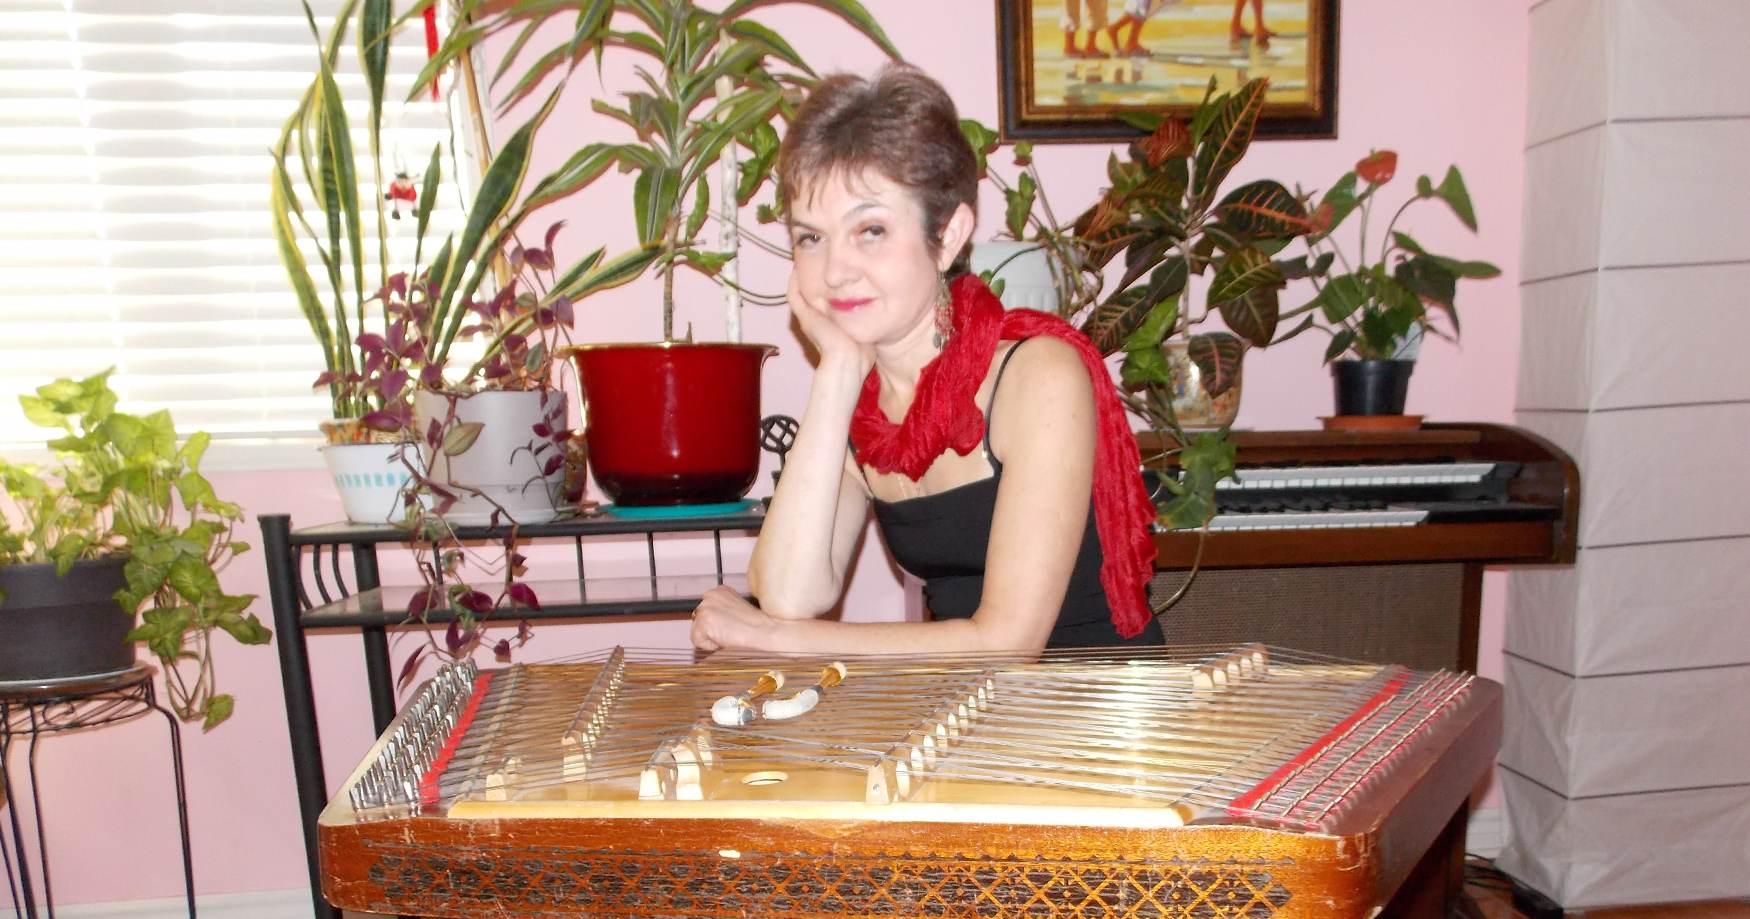 Composer Raisa Orshansky